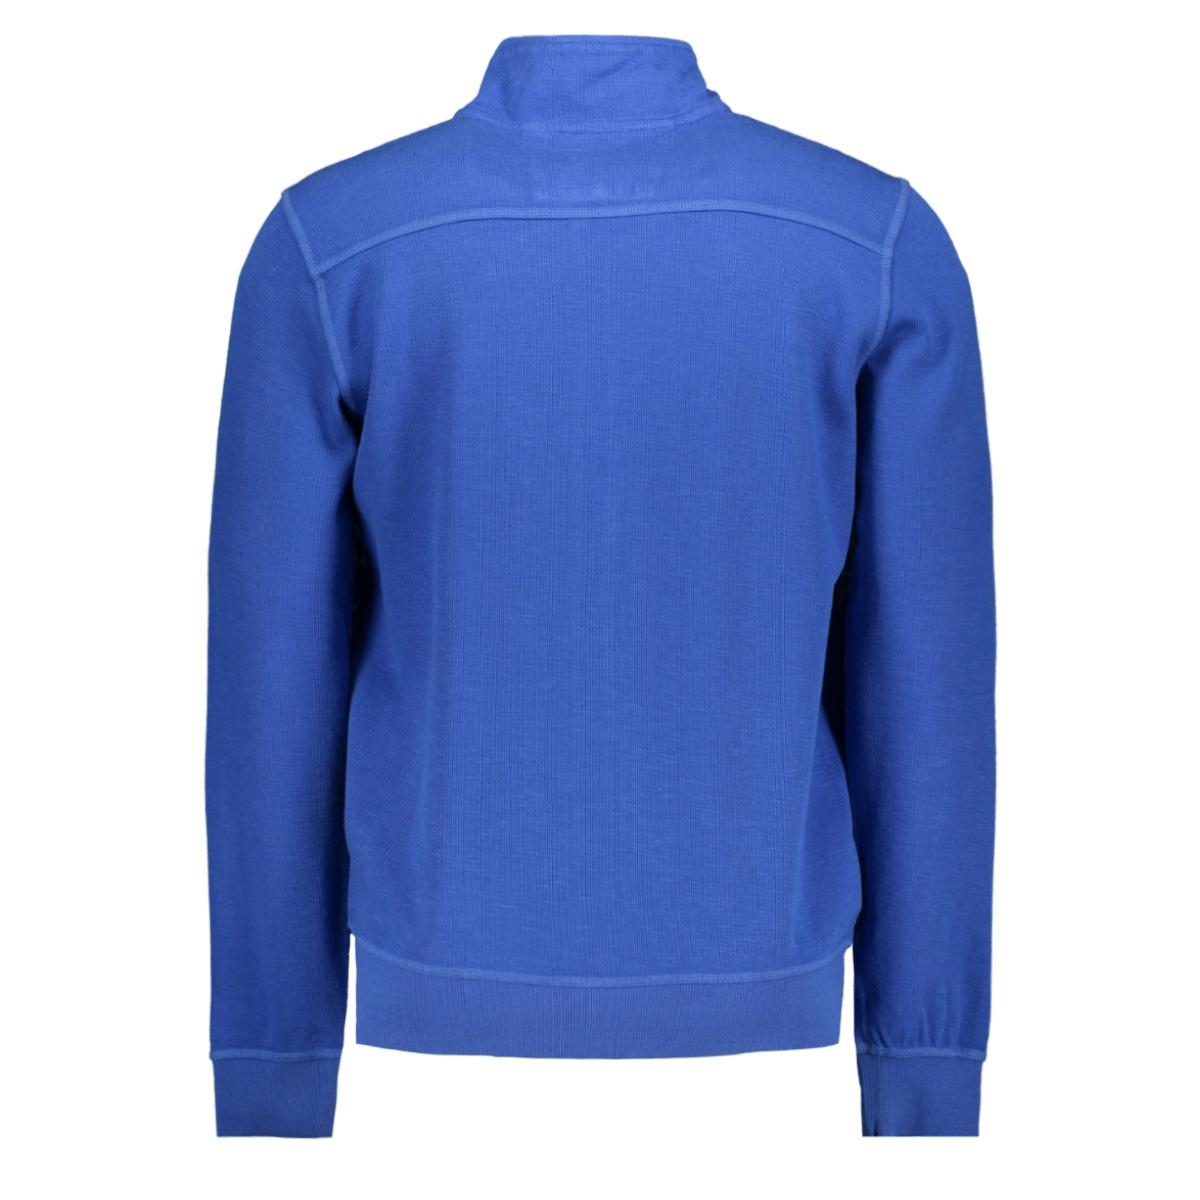 maratoto 20an323 nza vest 260 new blue